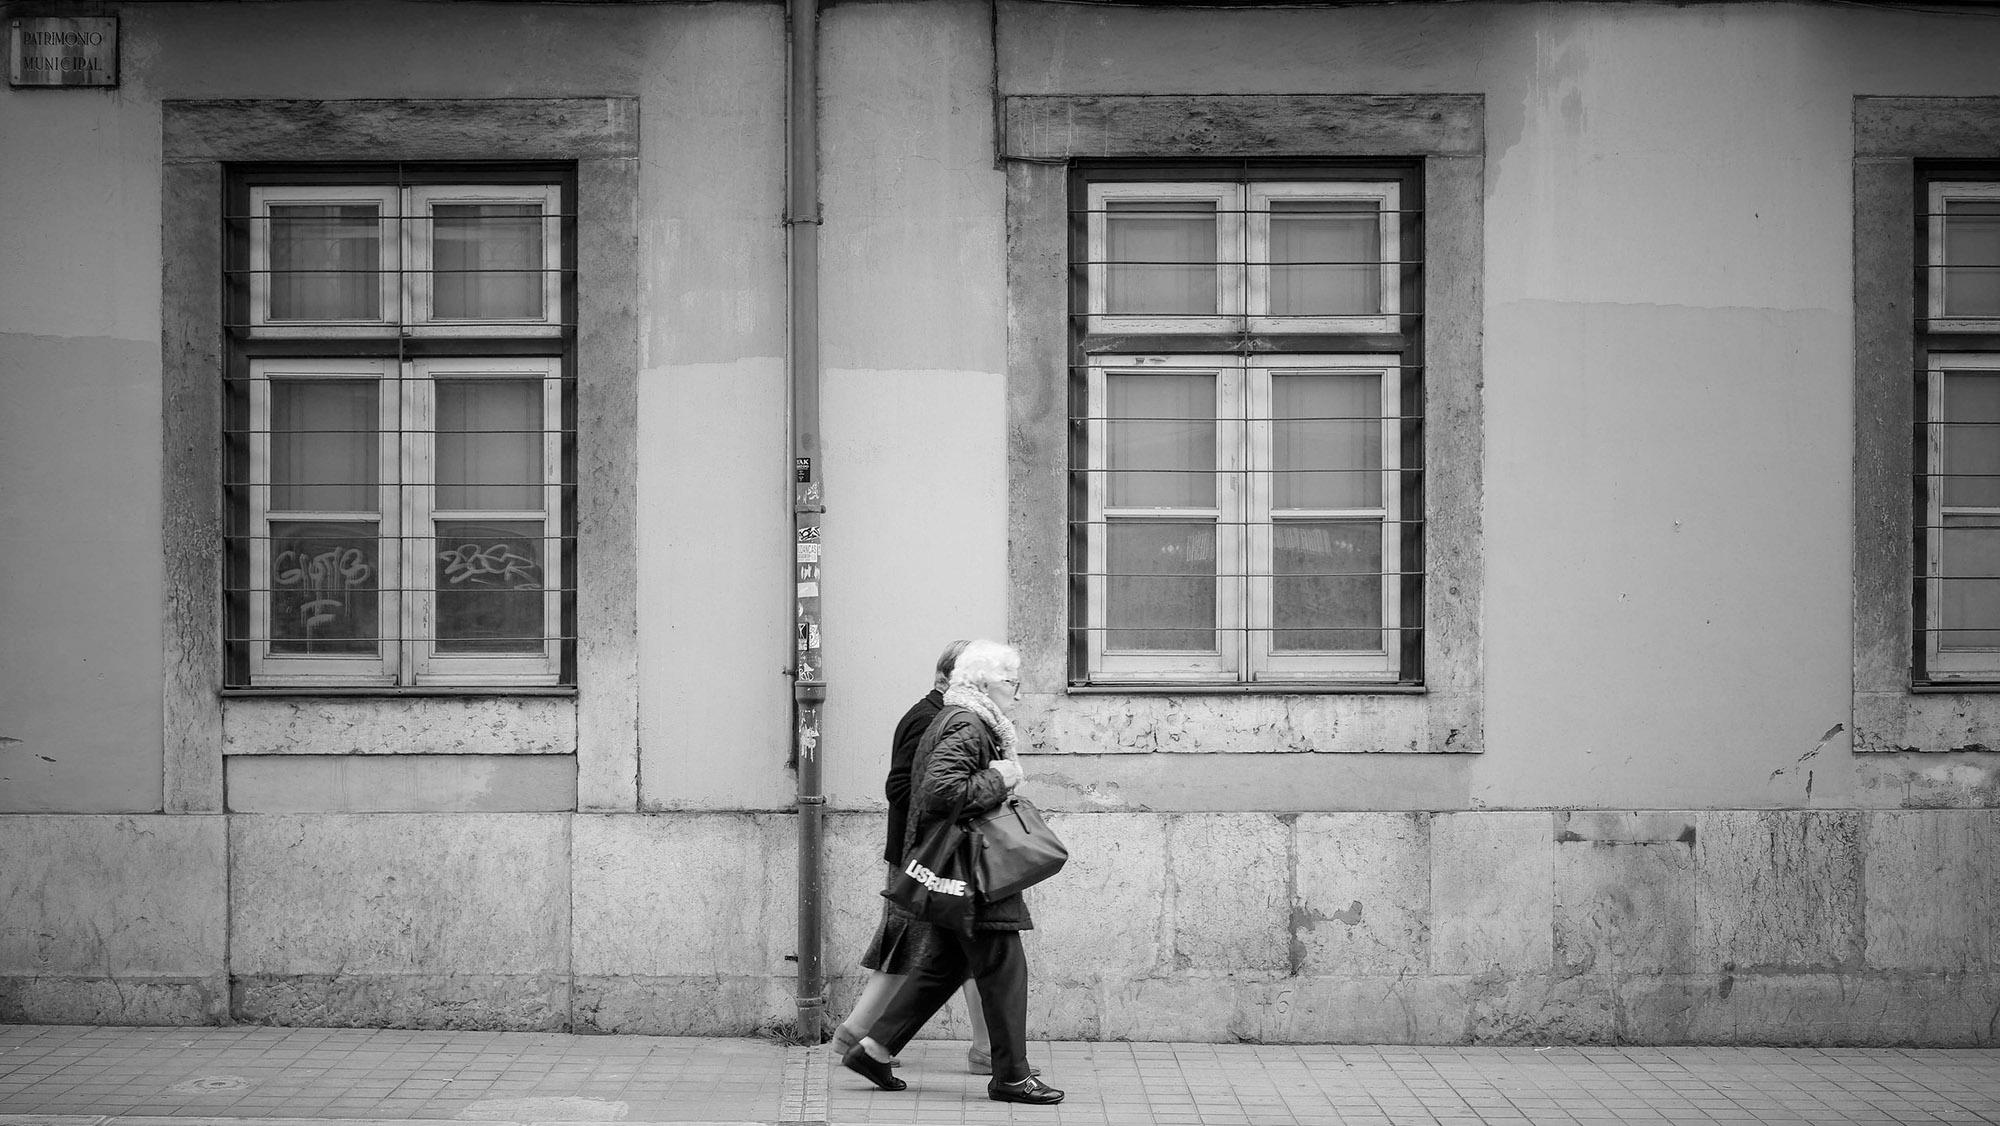 Chiado, Lisbon